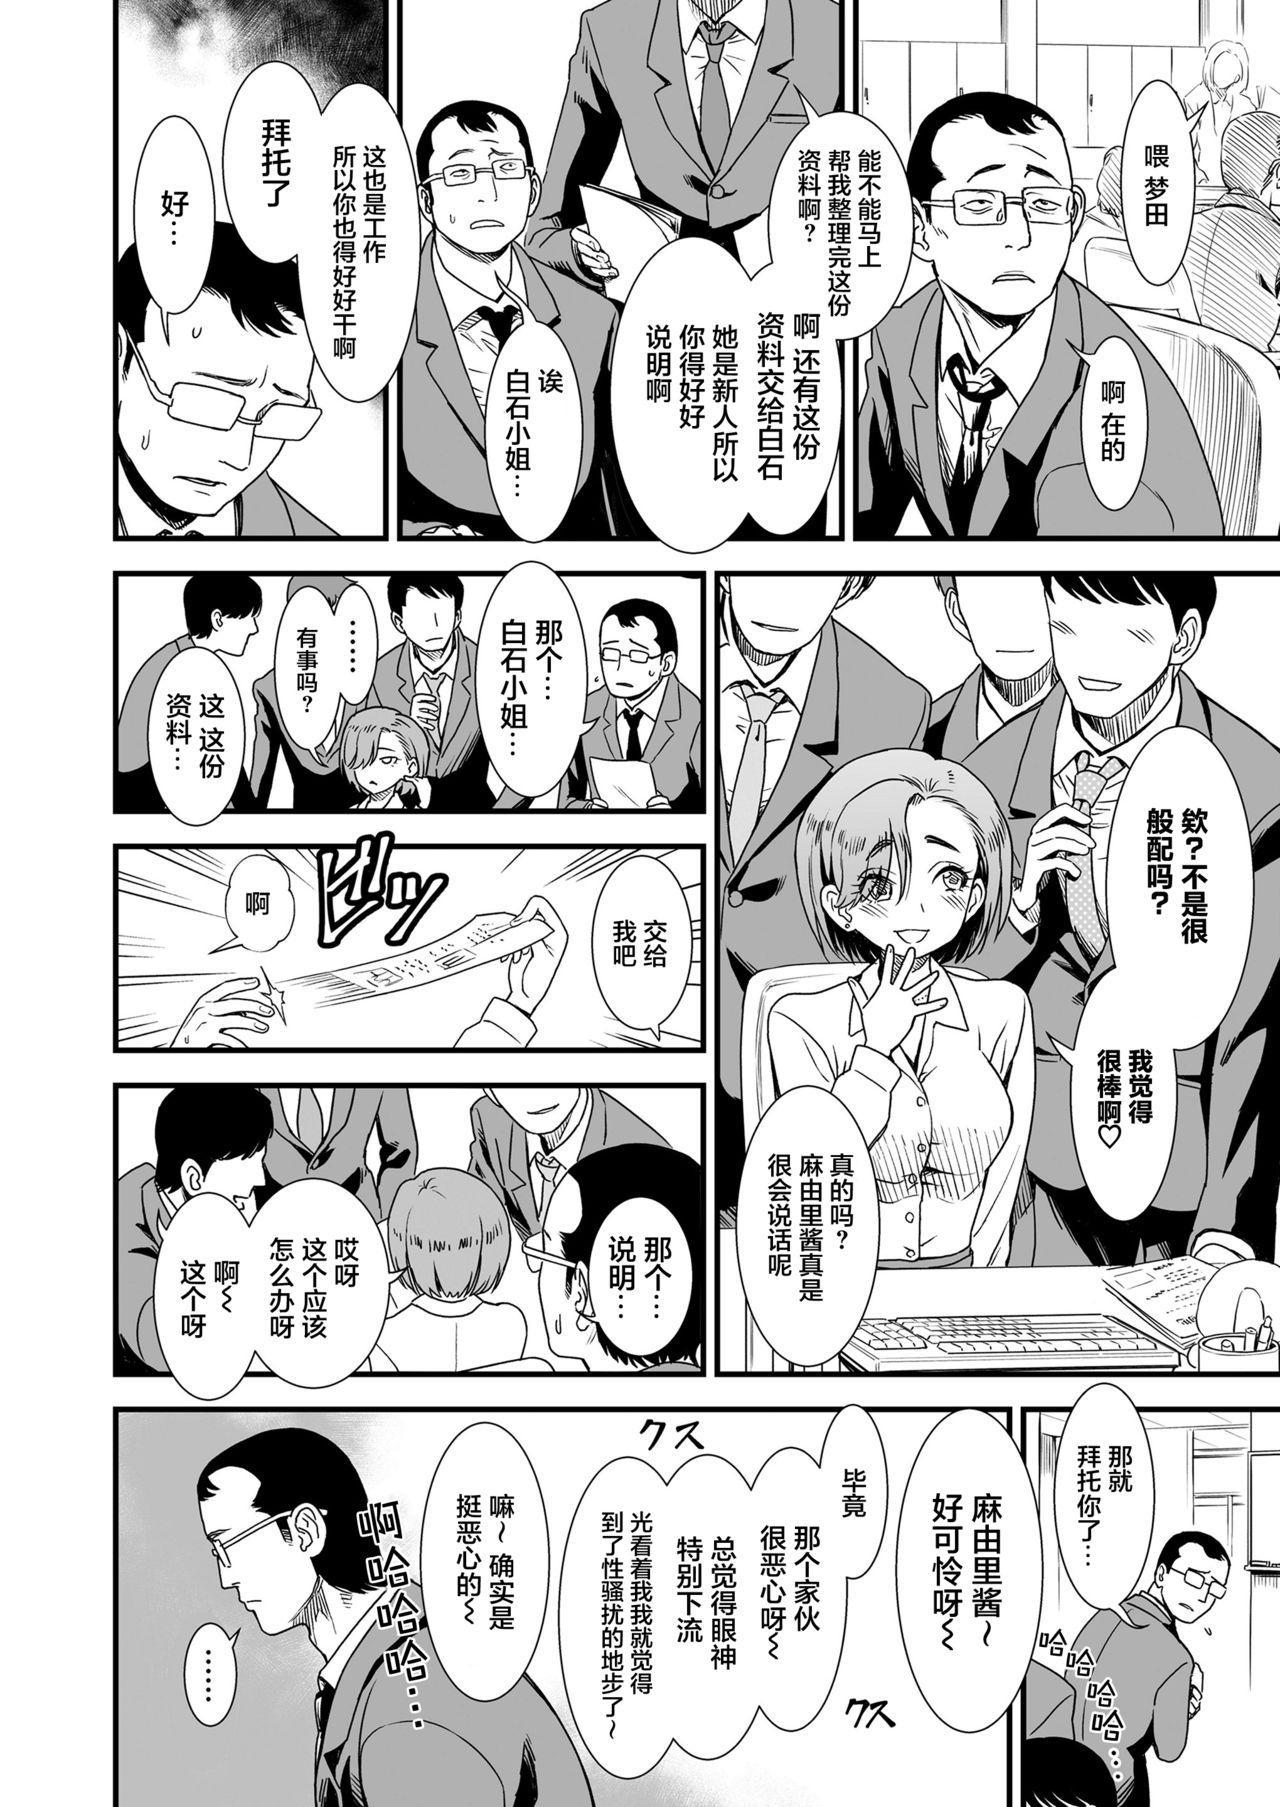 [Sabaku] Miss.Yoruko in midnight (Show your manliness to Yoruko)   「午夜时的夜子小姐「让夜子看看你男人的一面」」(COMIC LO 2021-06) [Chinese] [Digital] 2